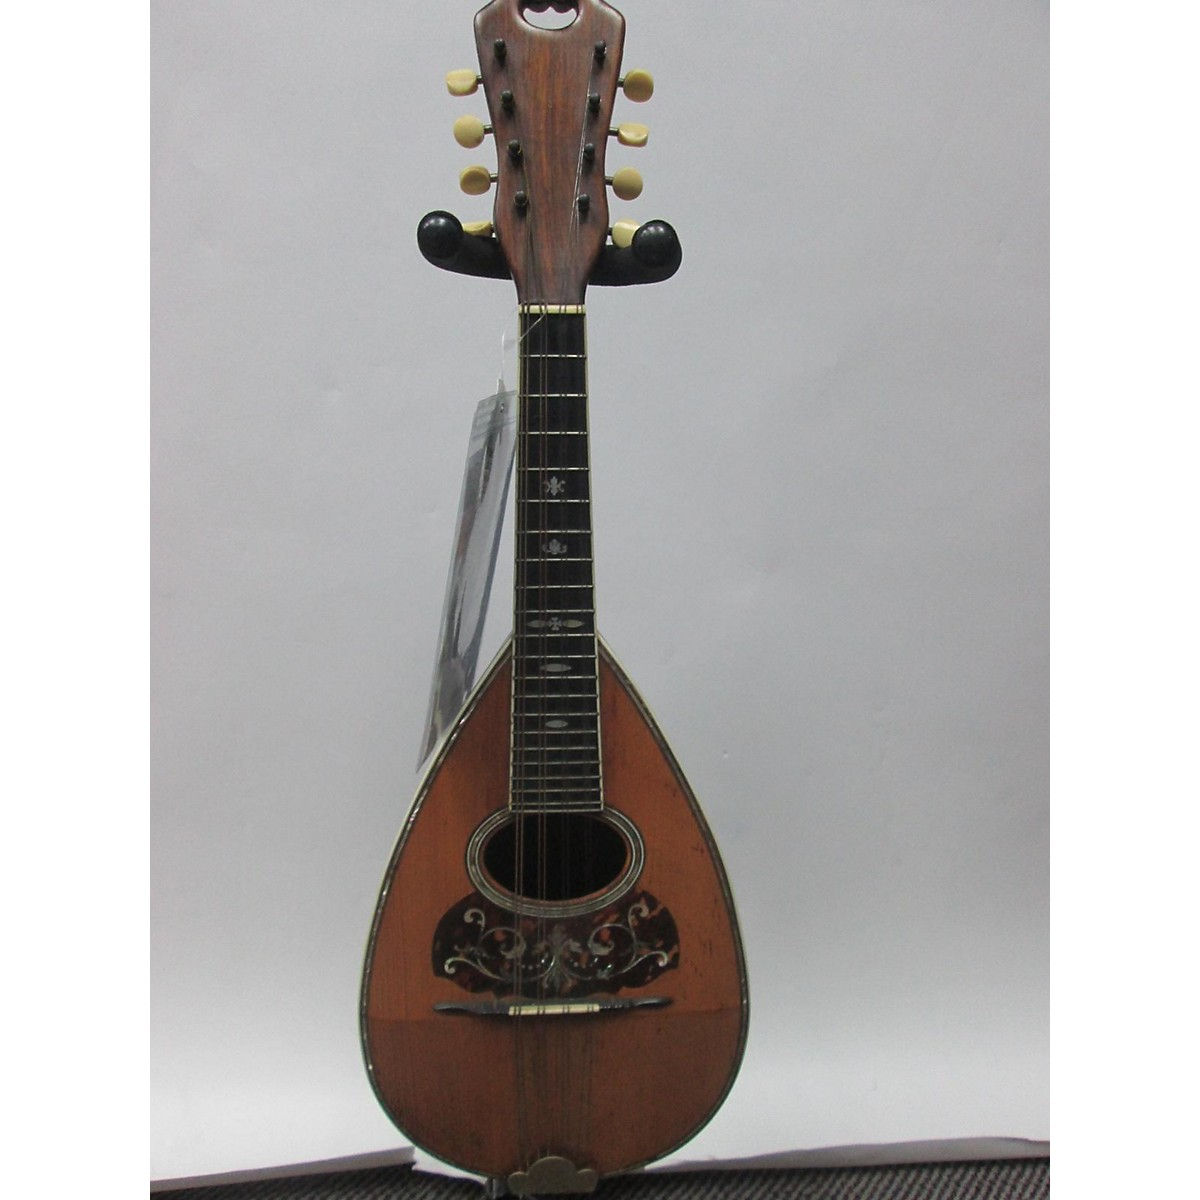 Martin 1905 No. 4 Mandolin